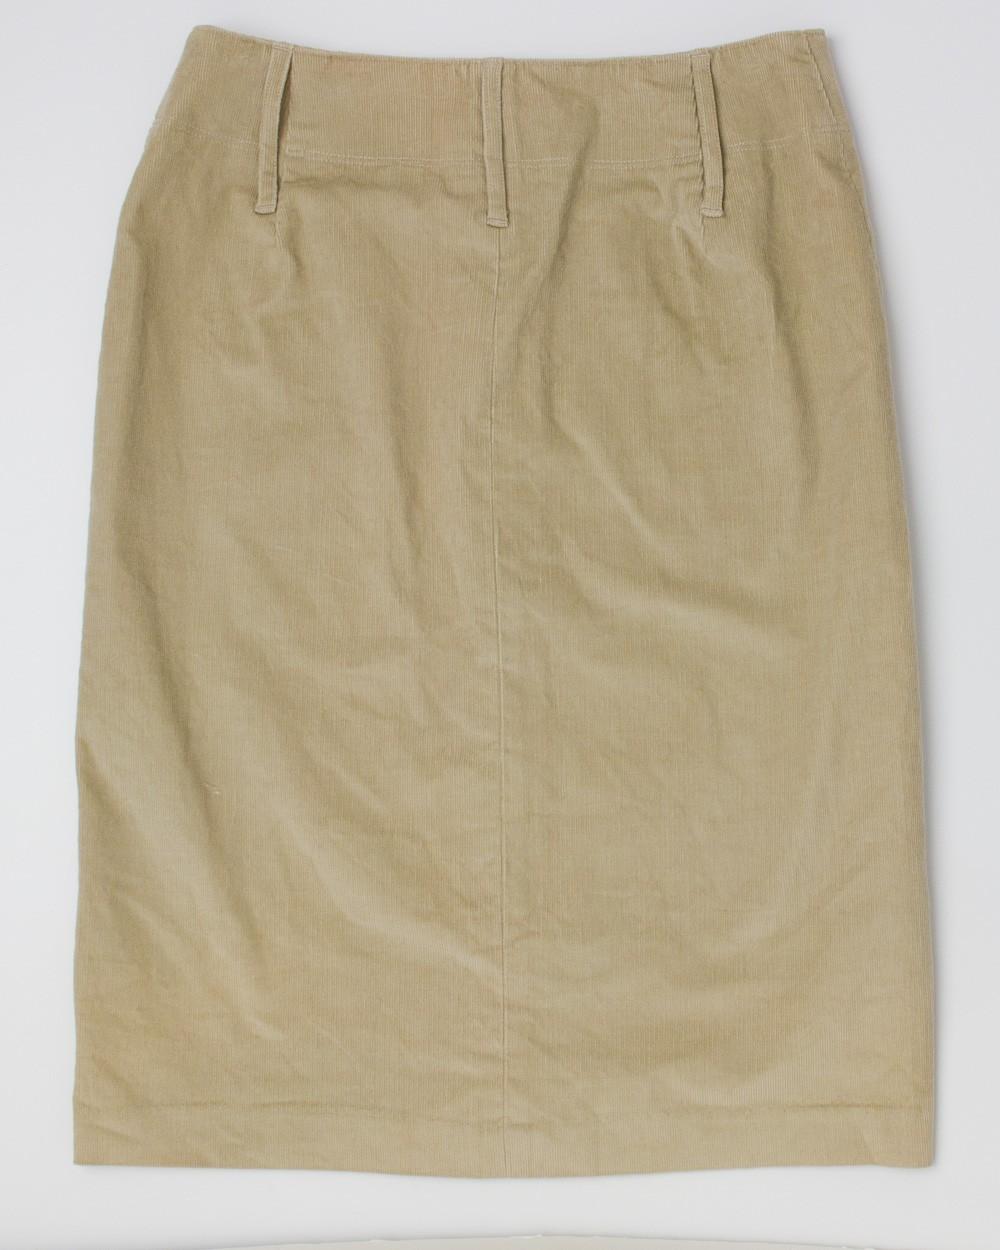 express corduroy skirt s 1 2